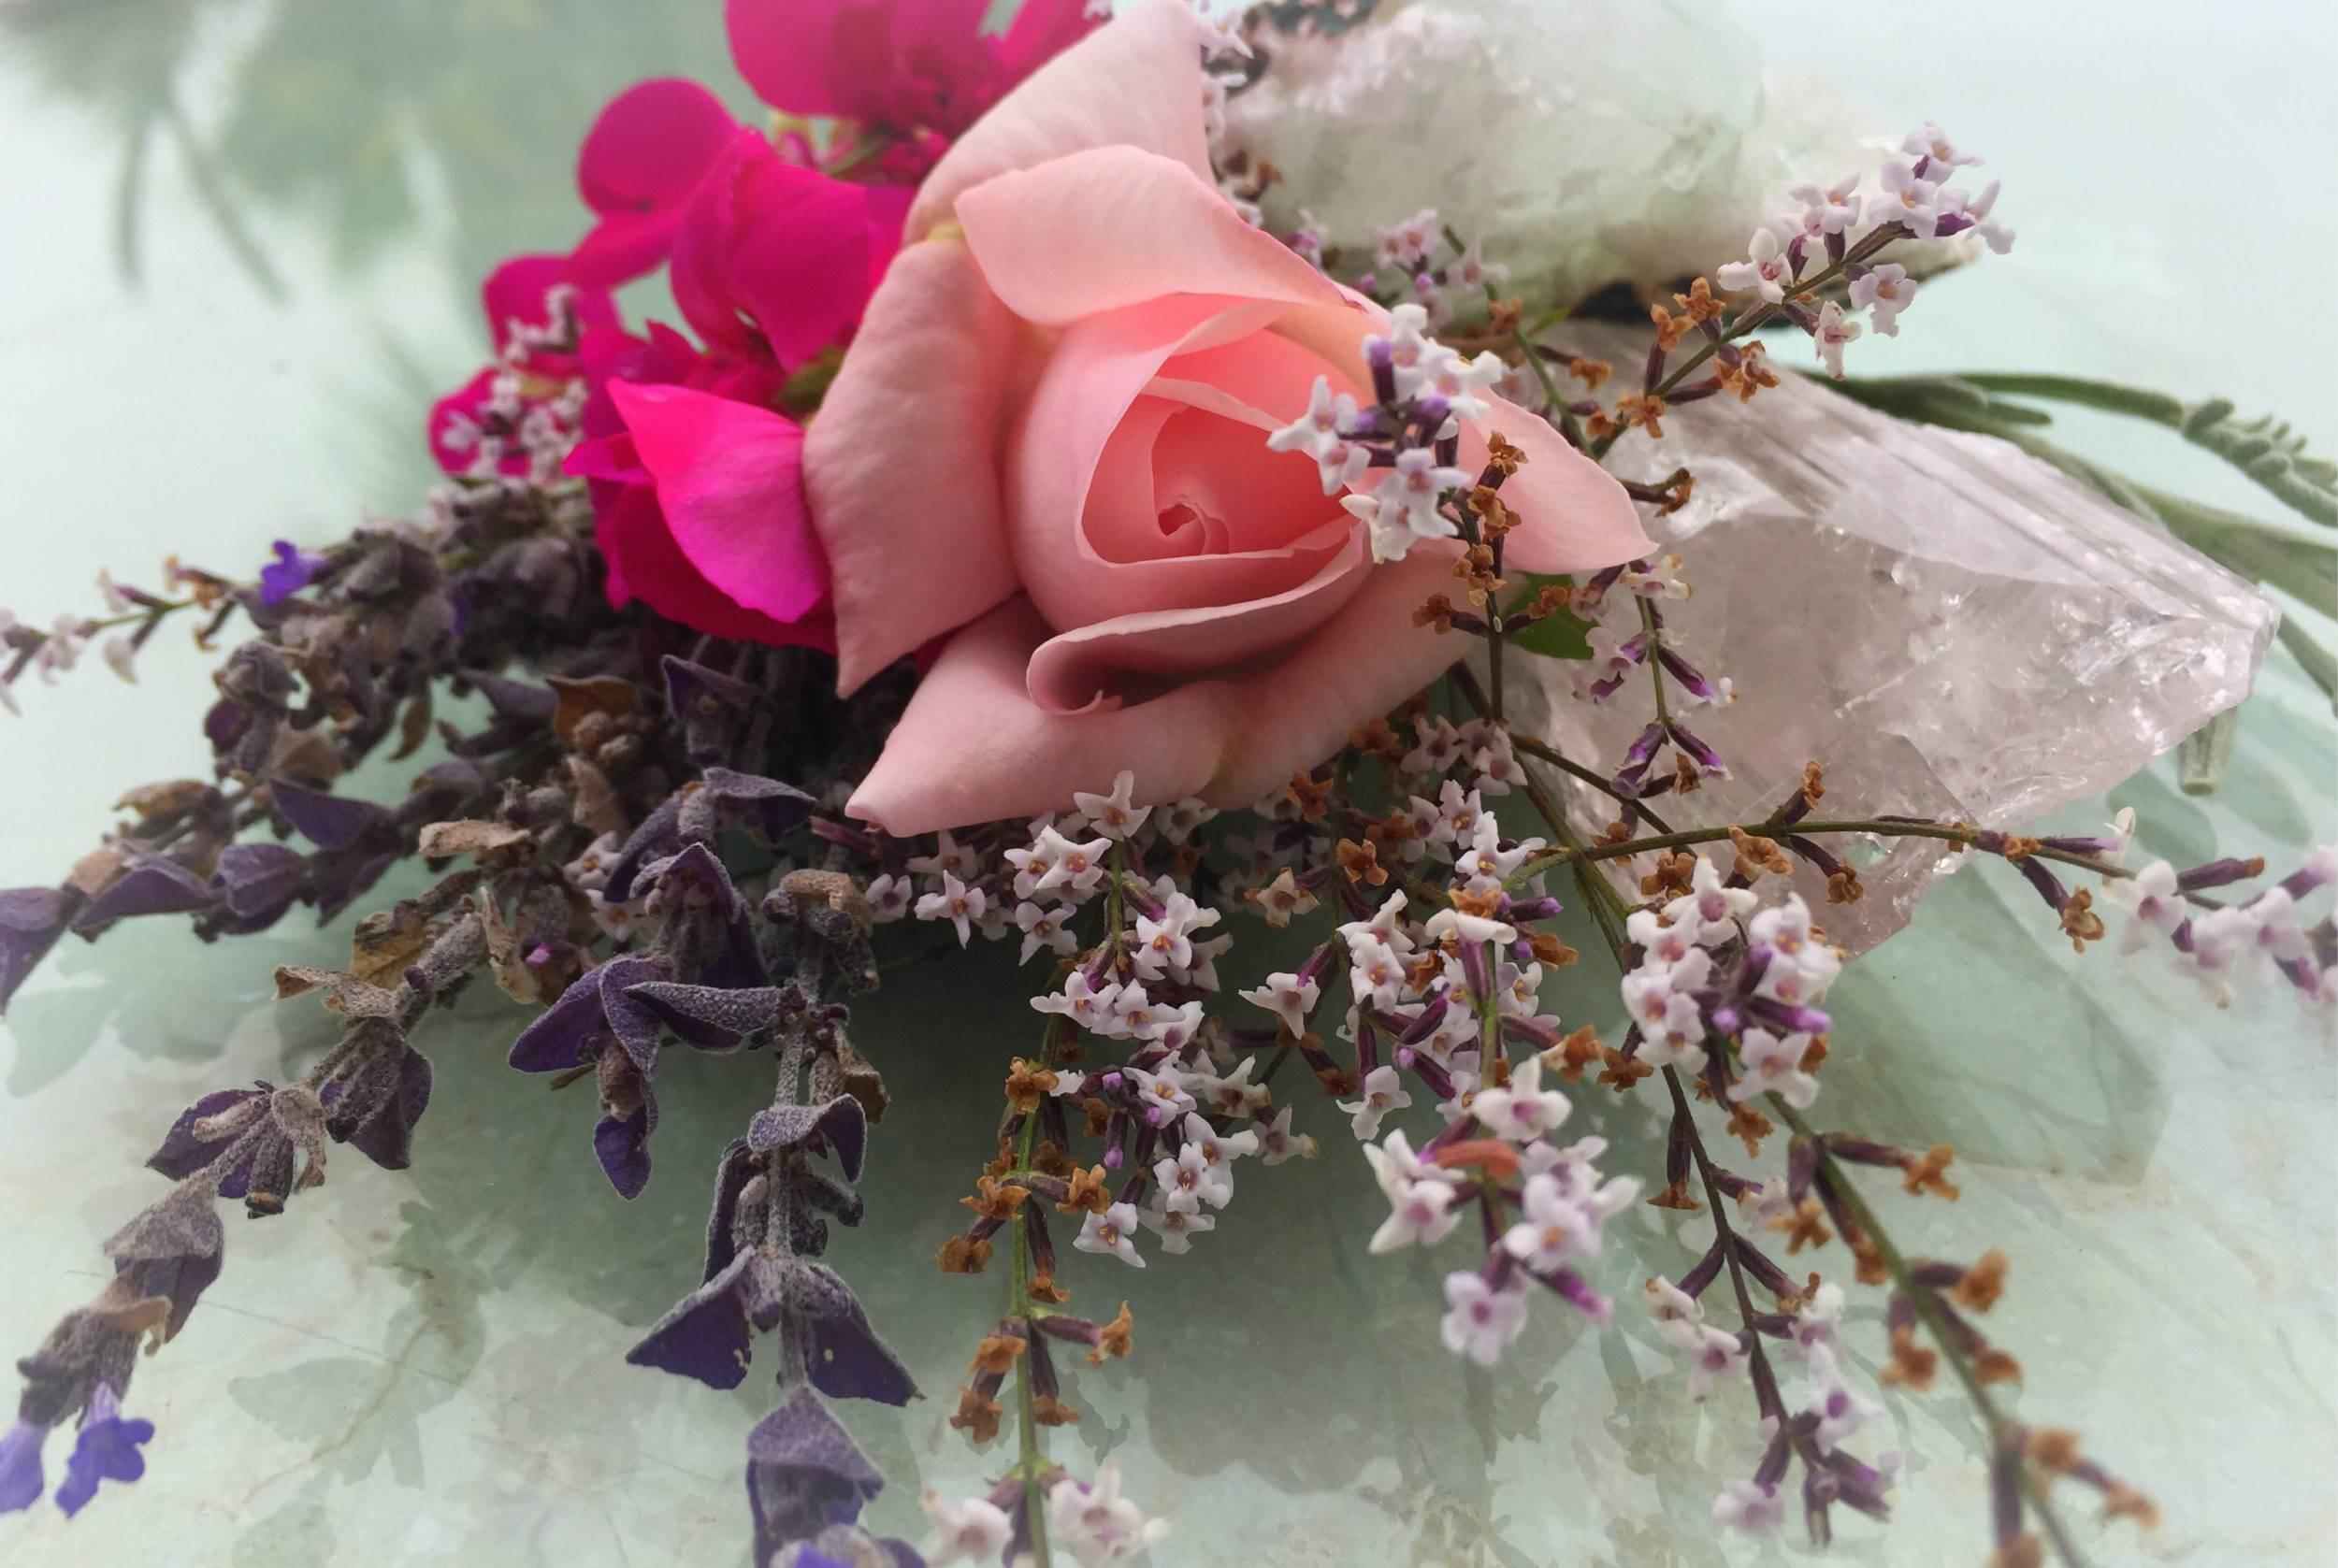 Five tips for wellness & sacred healing